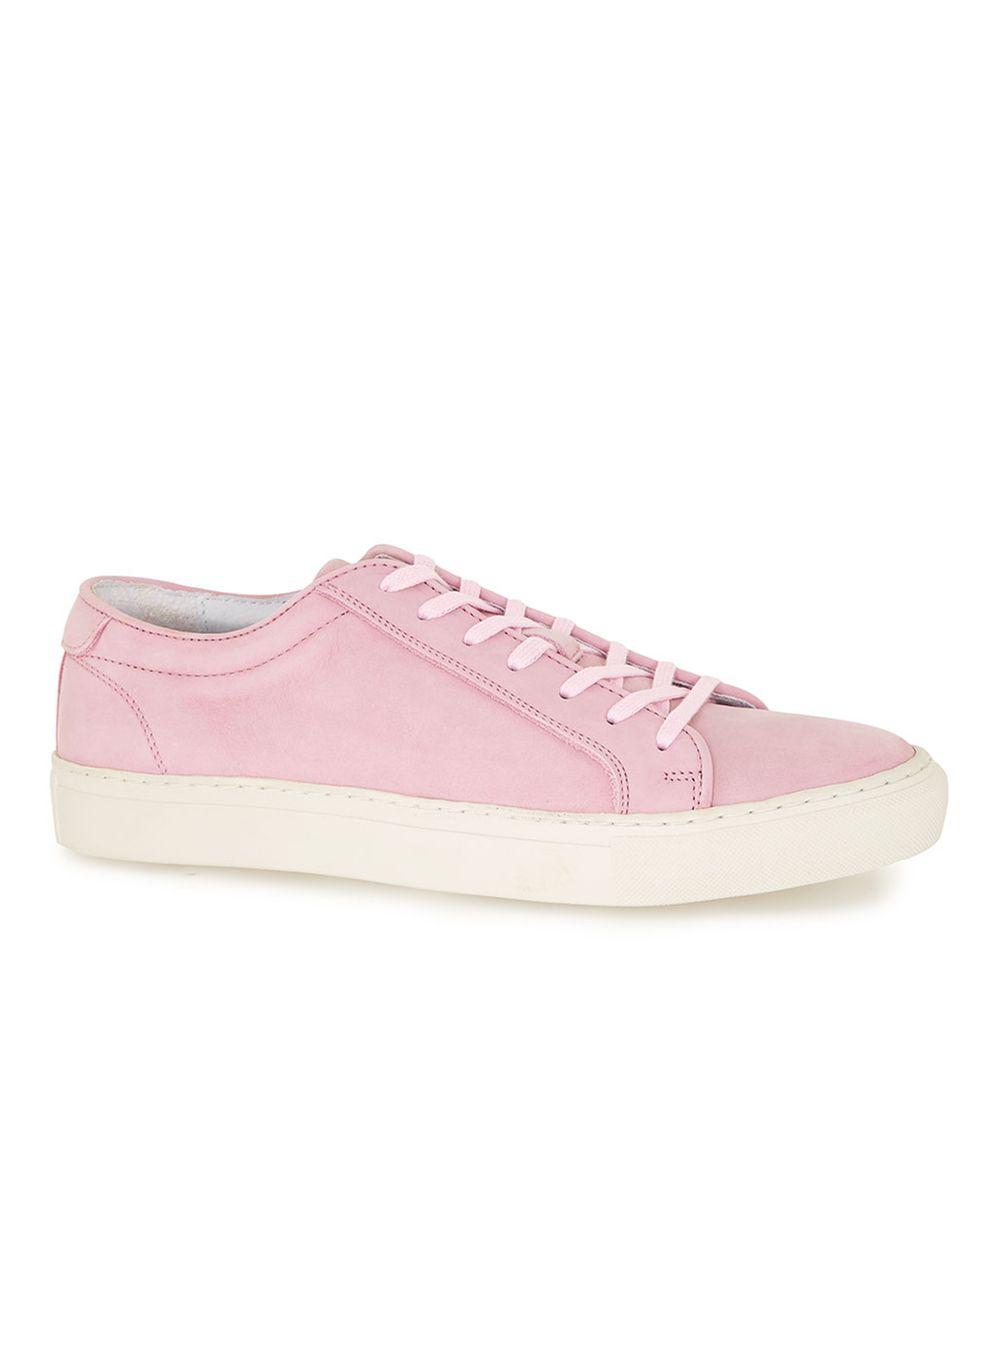 topman_pink sneaker